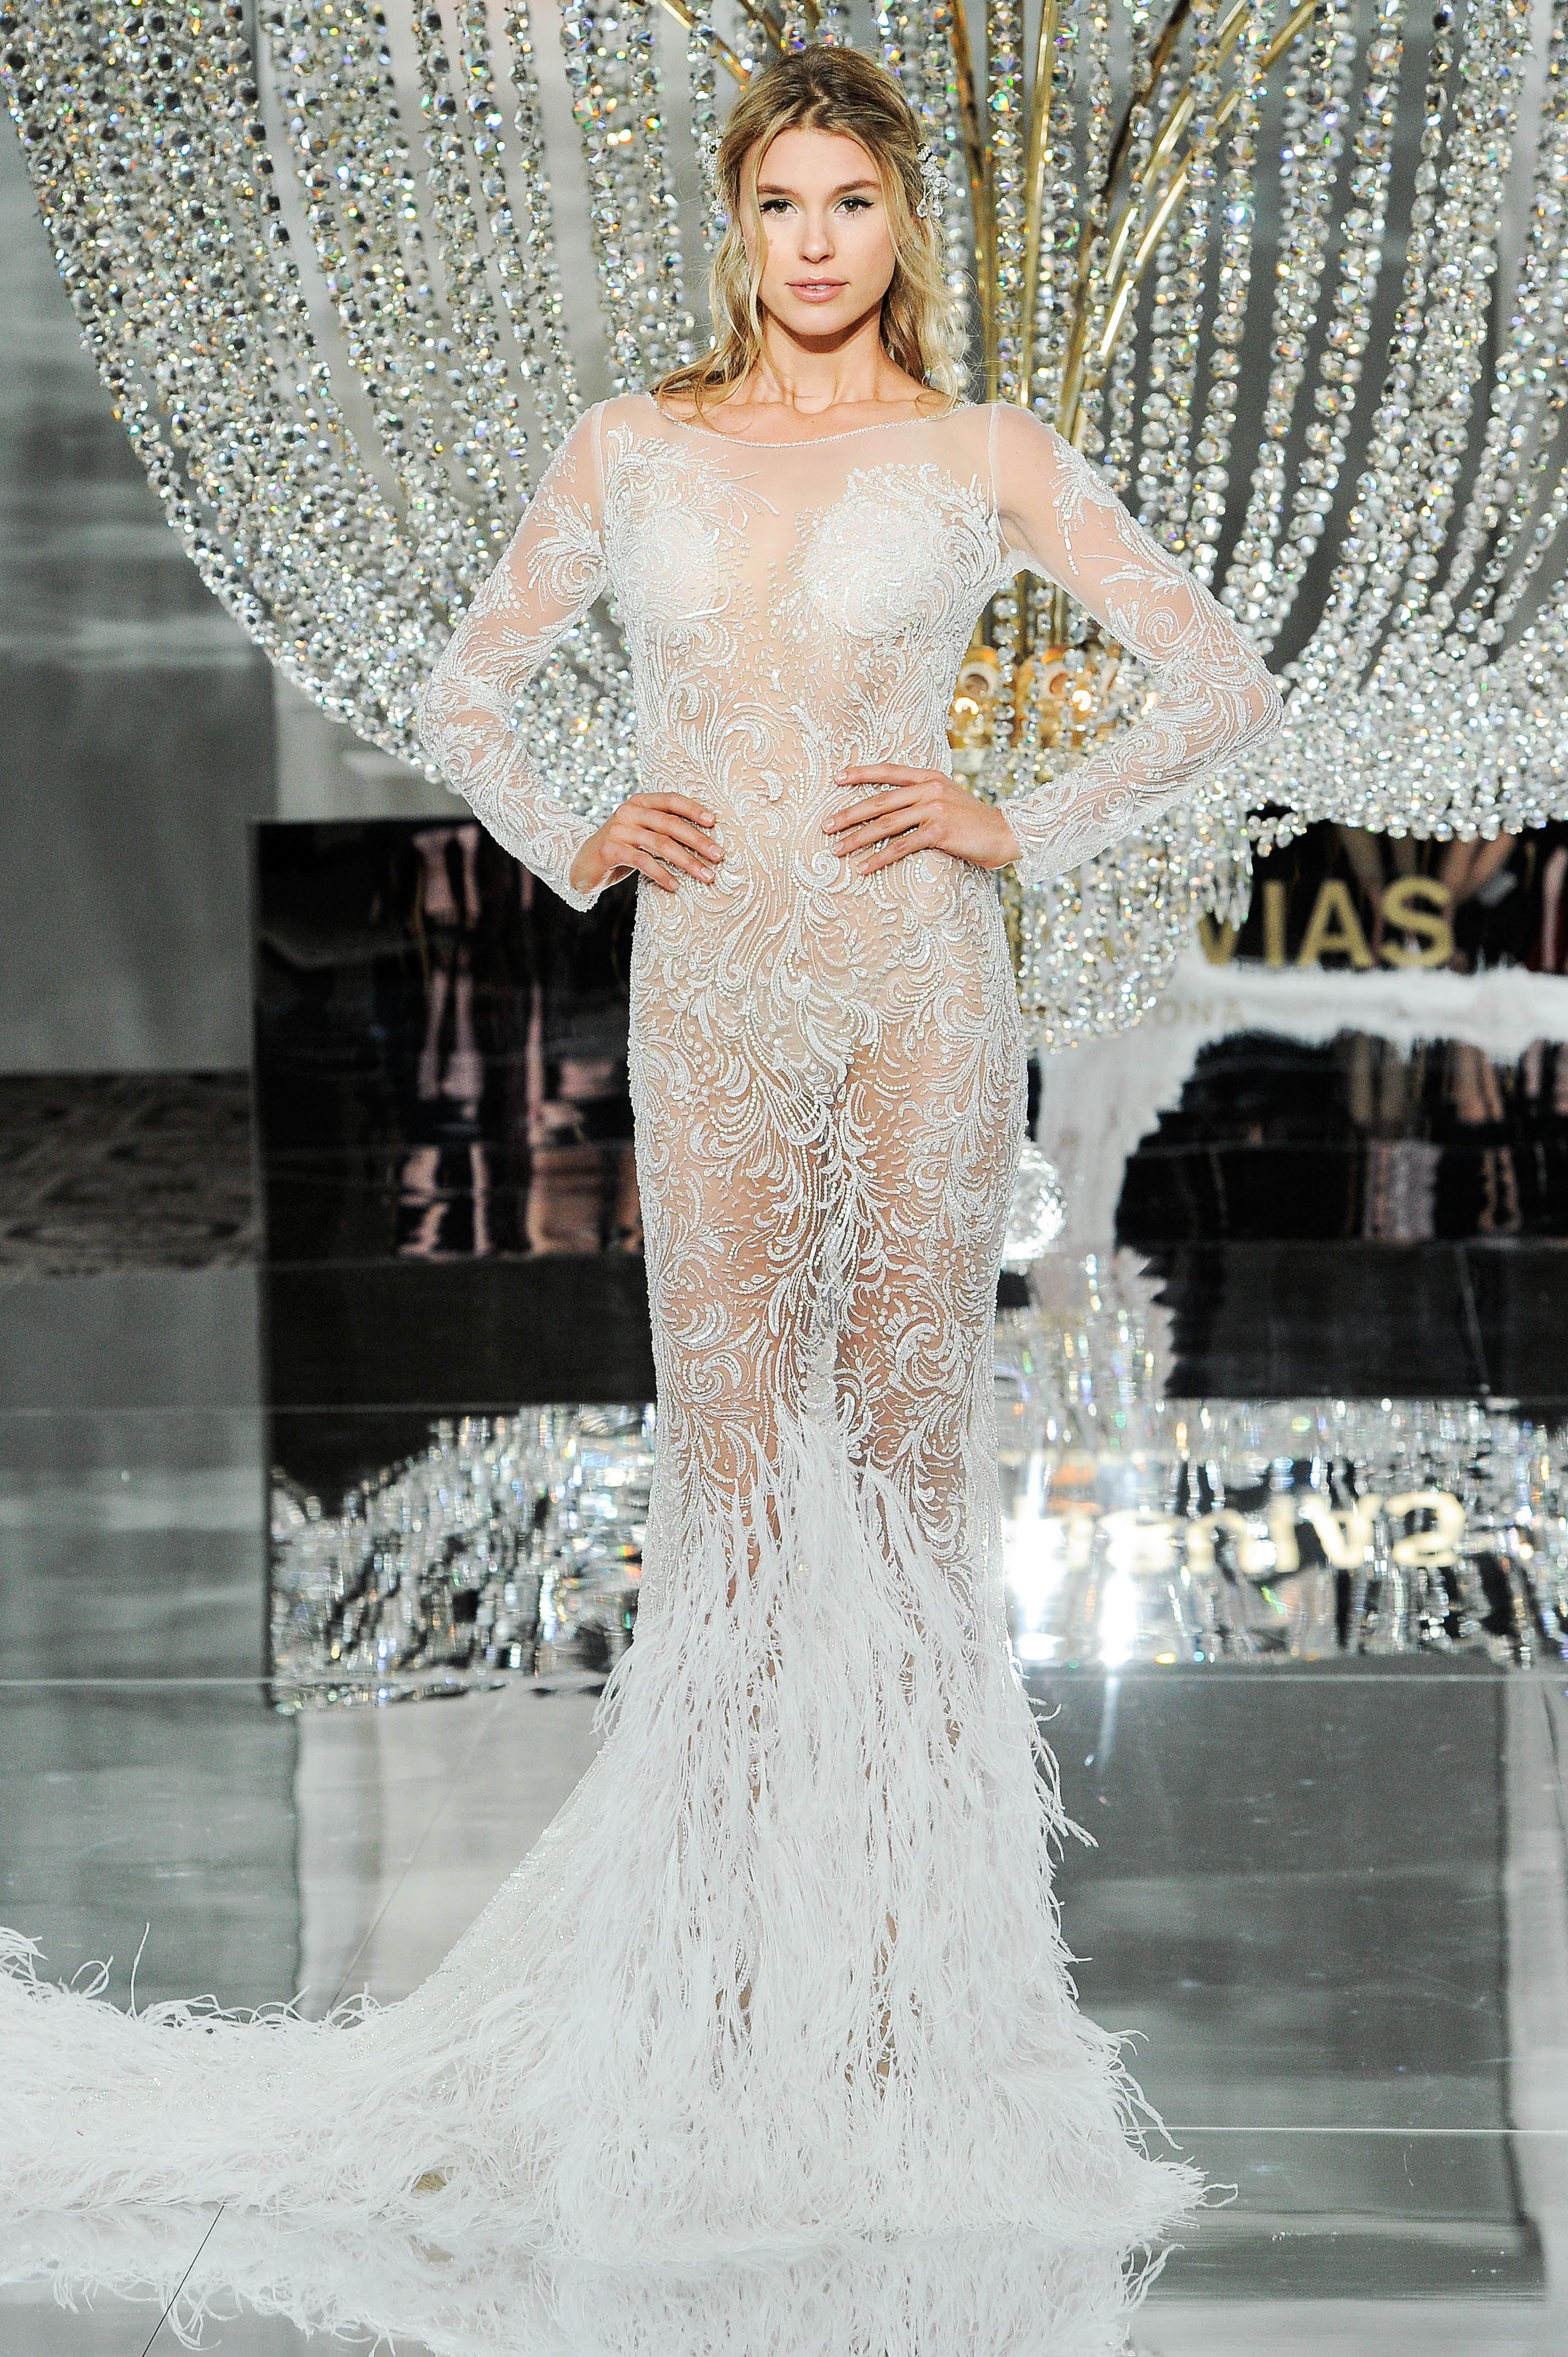 pronovias wedding dress fall 2018 long sleeves sheer embellished feathers